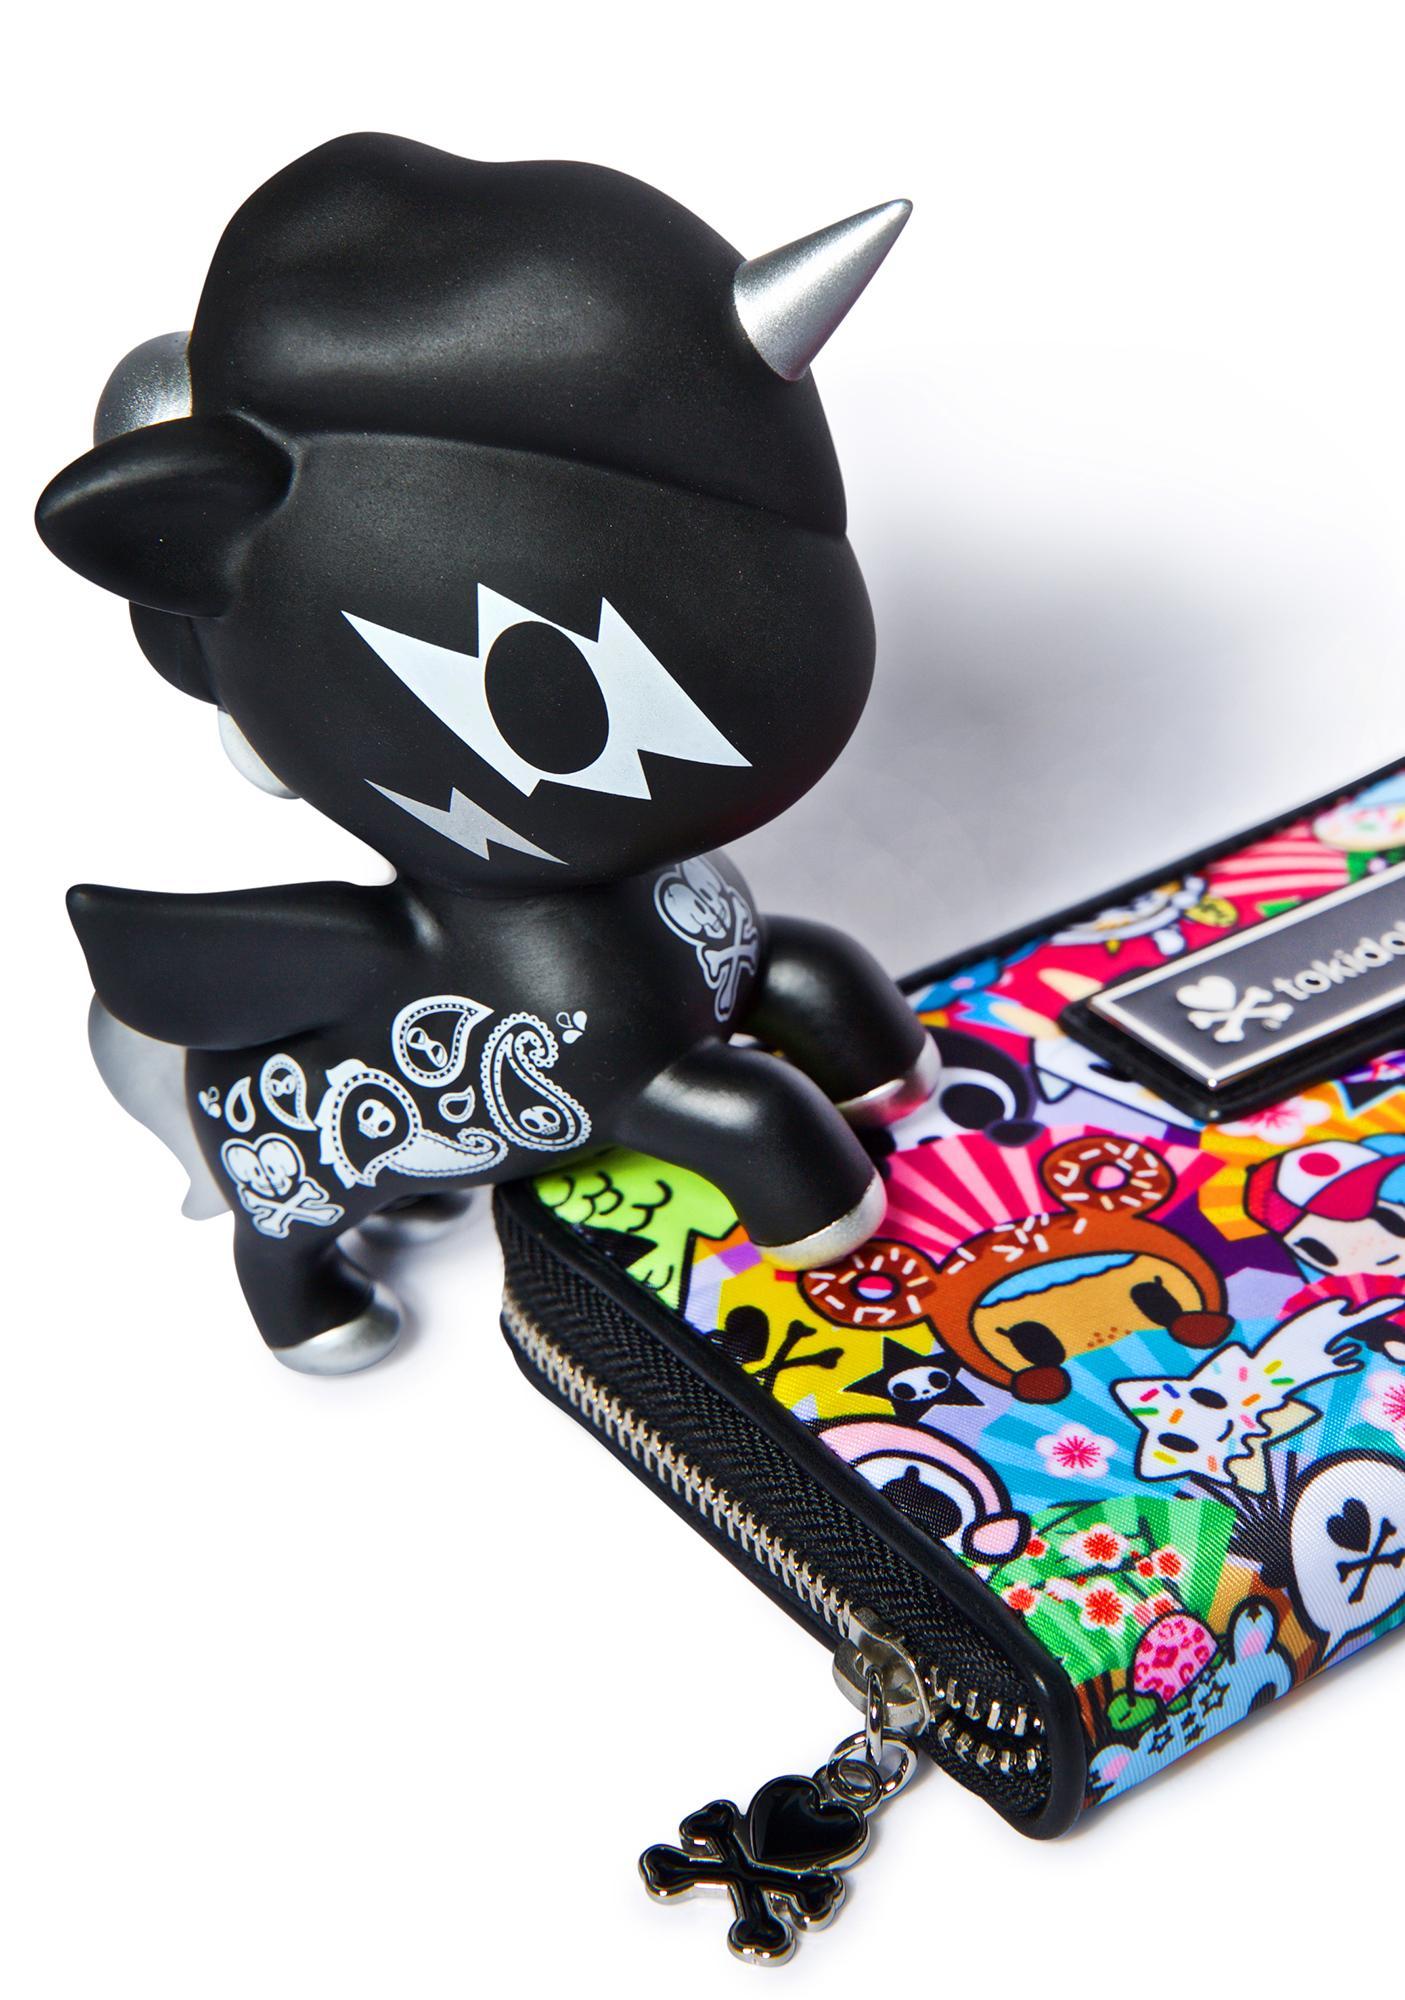 Tokidoki Unicorno 10 Year Vinyl Toy in Black